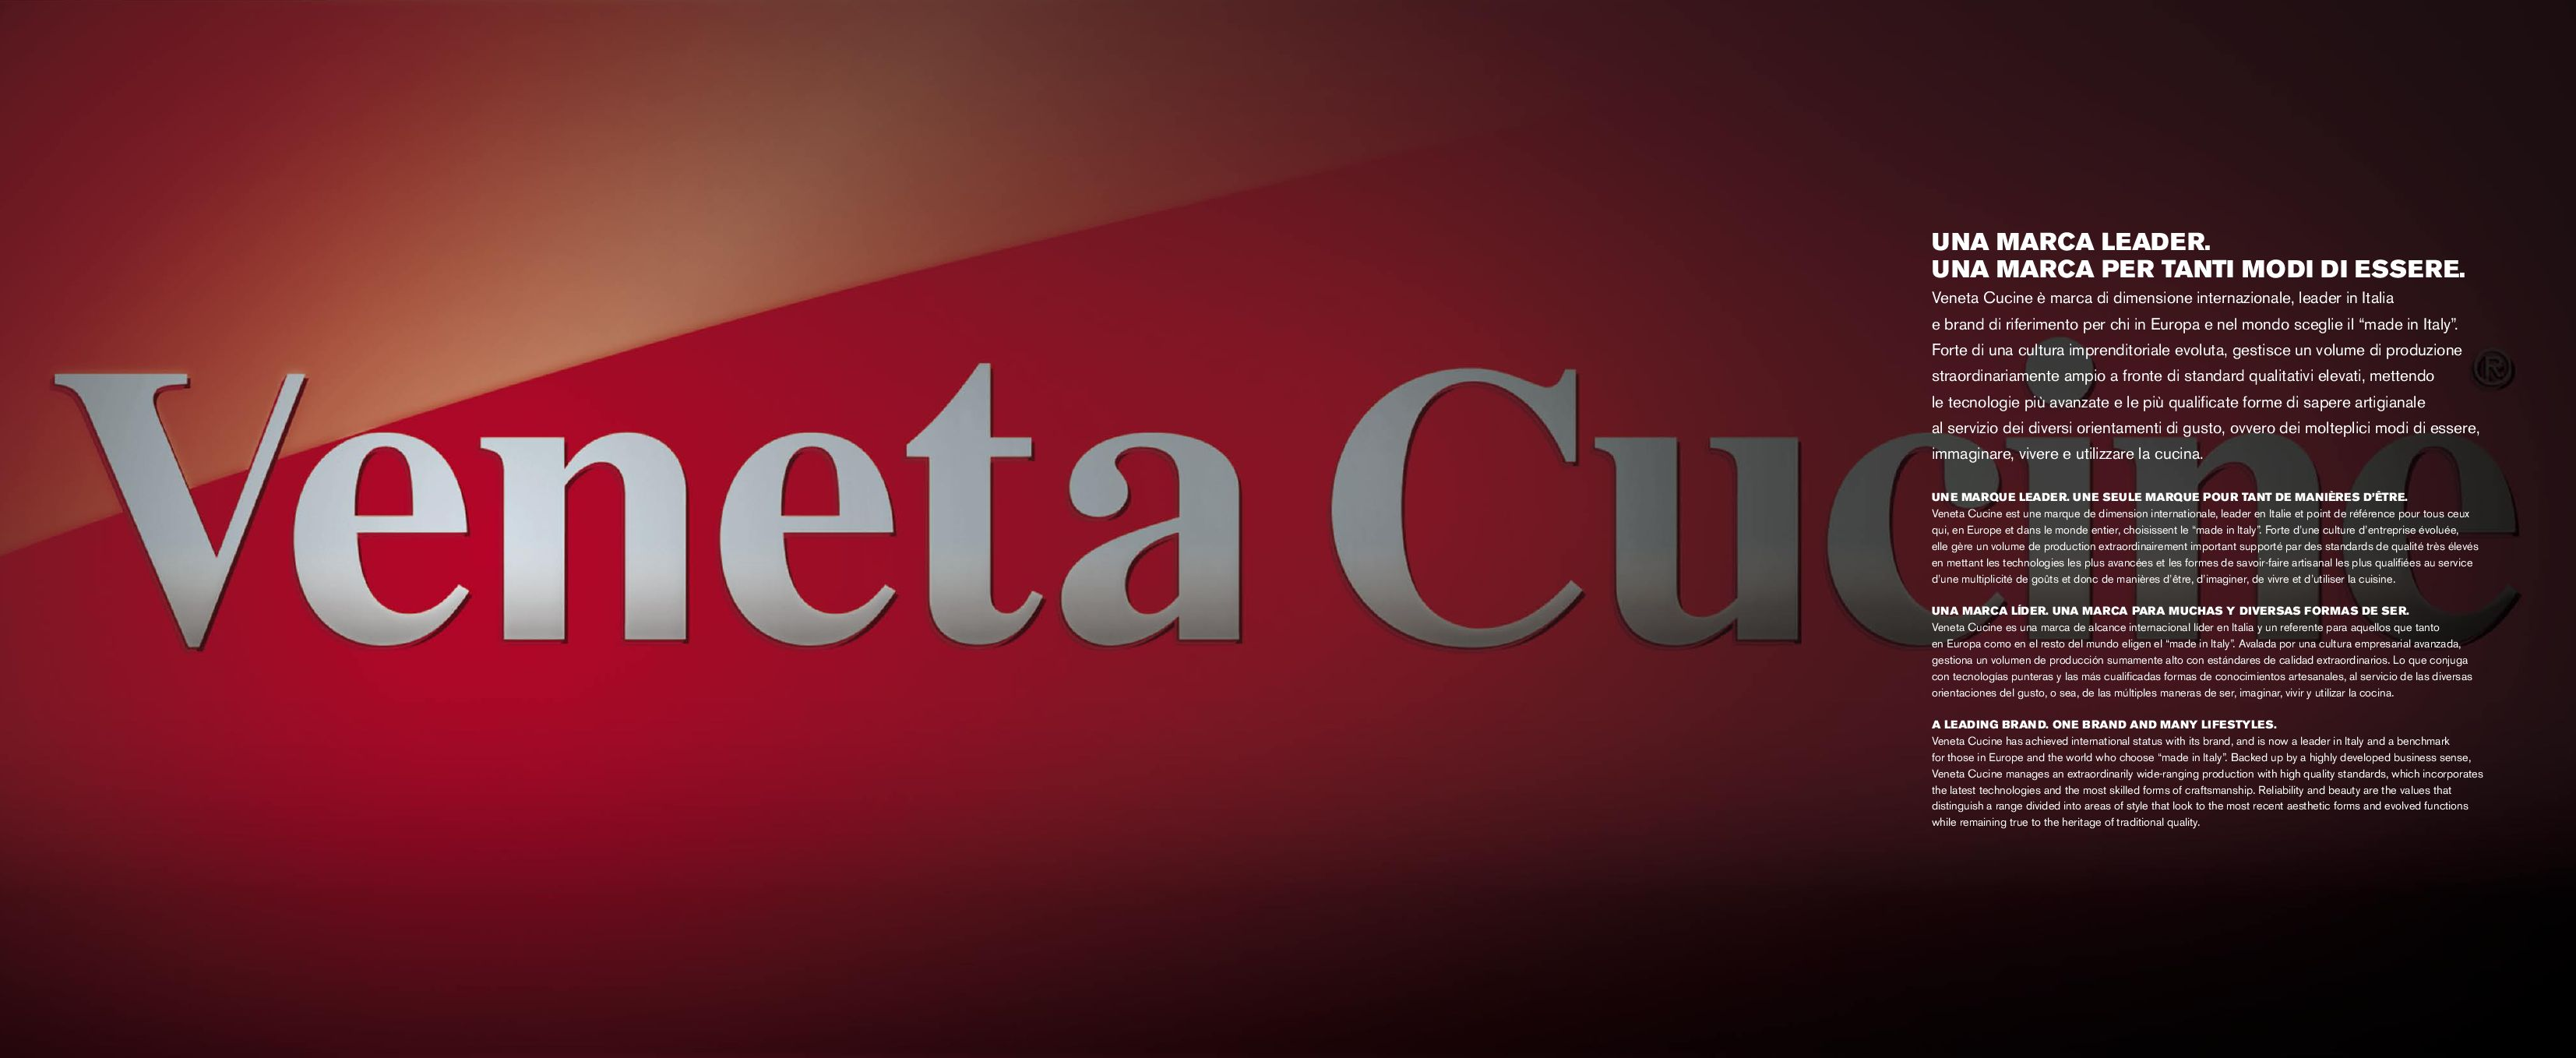 Catalogue Veneta Cucine By Bestreet Issuu #AE0827 3307 1358 Veneta Cucine è Una Buona Marca